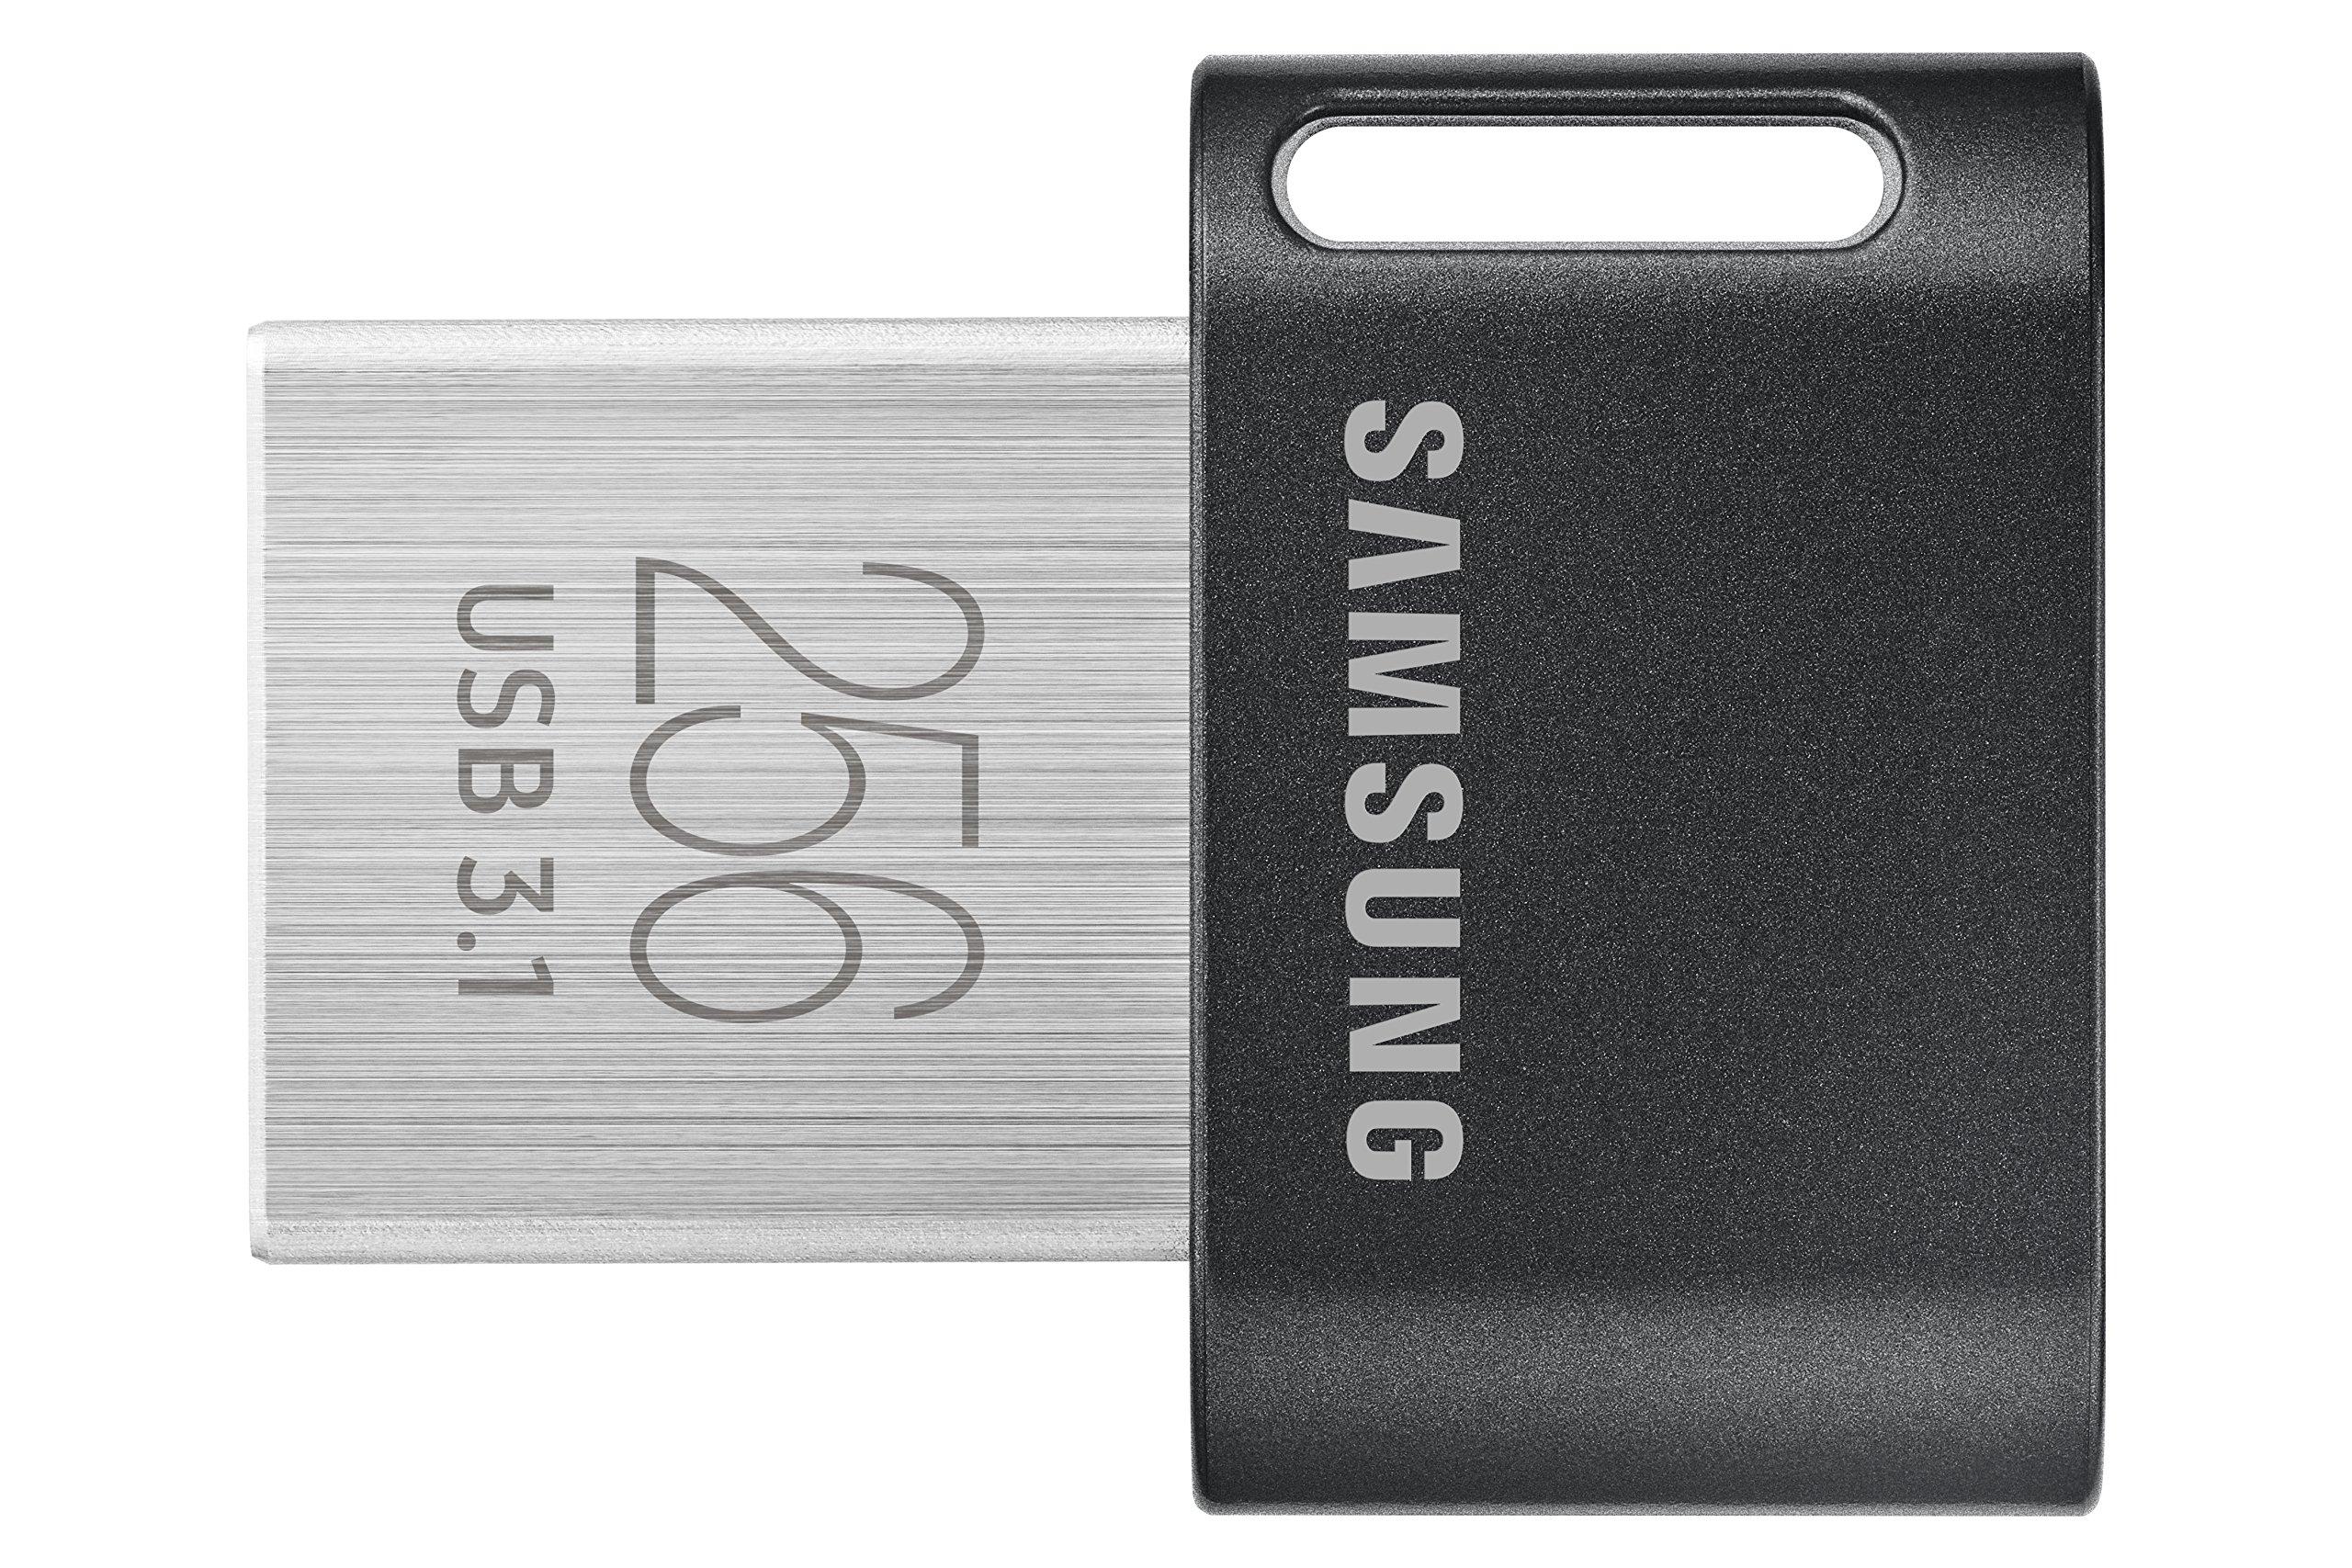 Samsung MUF-256AB/AM FIT Plus 256GB - 300MB/s USB 3.1 Flash Drive by Samsung